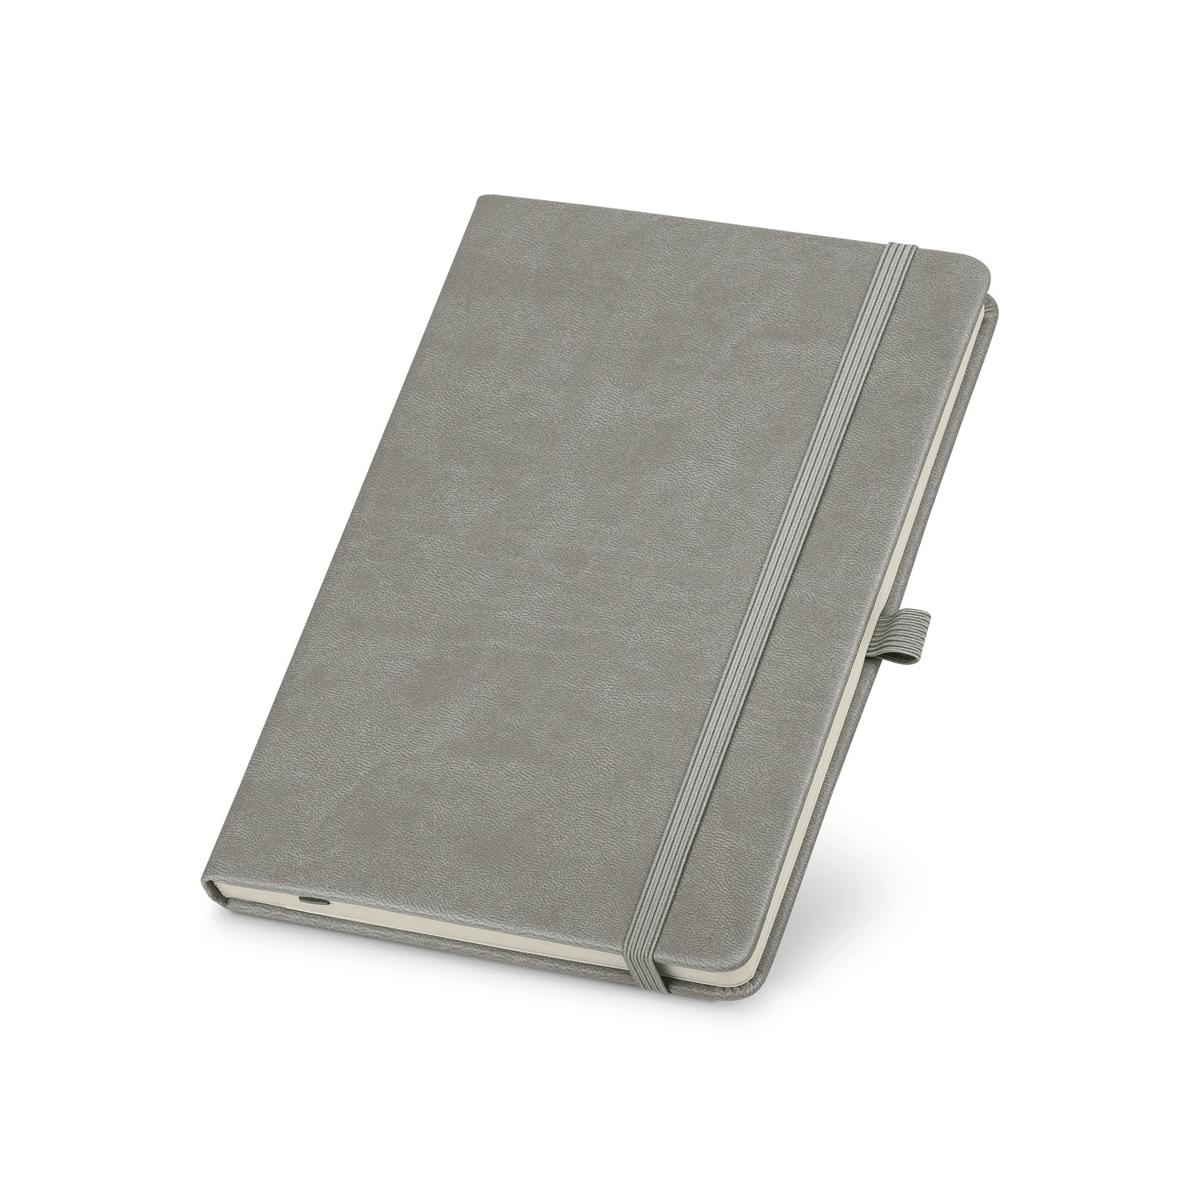 Notatnik A5 z kieszonką